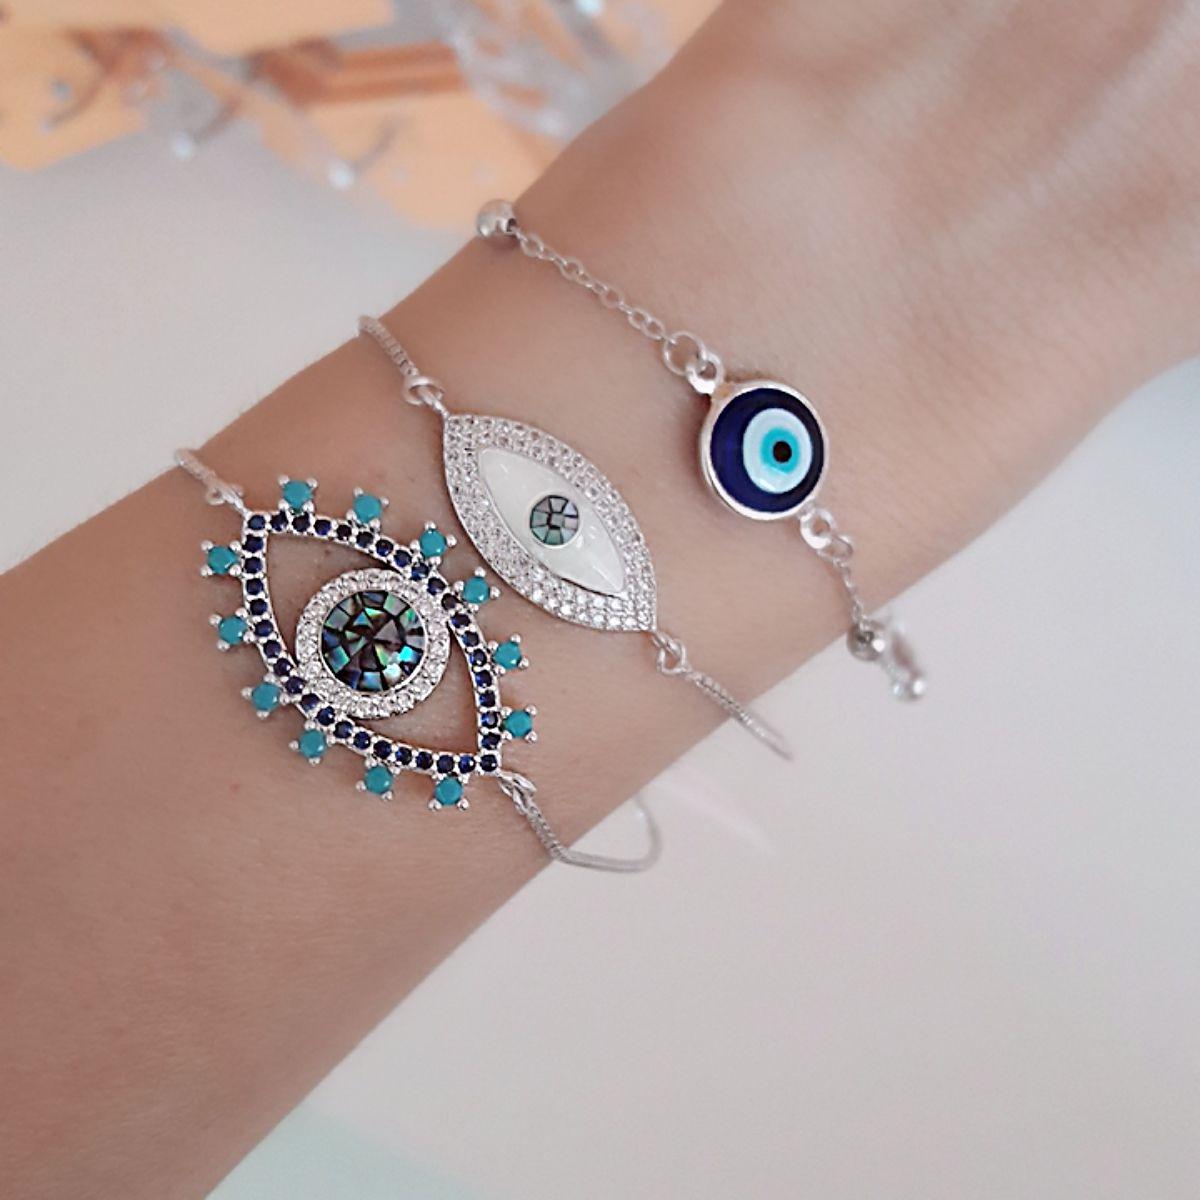 Pulseira Olho Grego ou Olho Turco Azul Semijoia Ródio Branco  - Soloyou